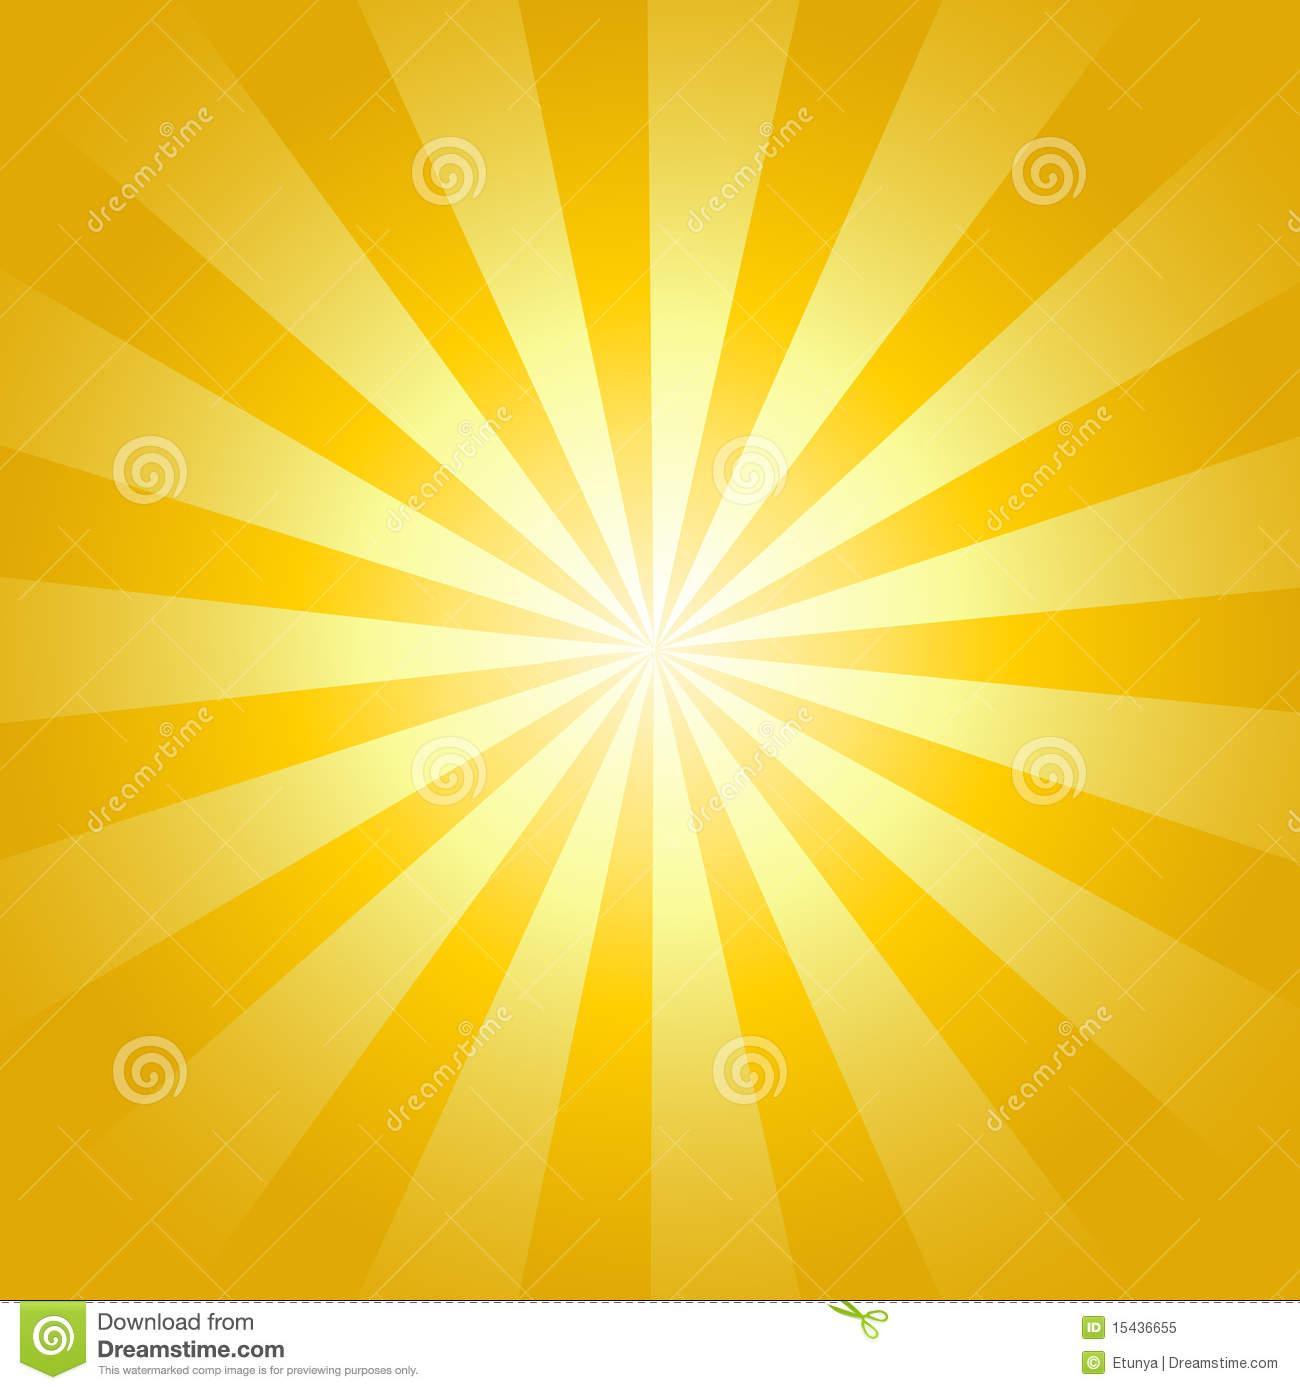 Yellow clipart sunrise Sunrise Clipart Wallpaper Sunrise Download